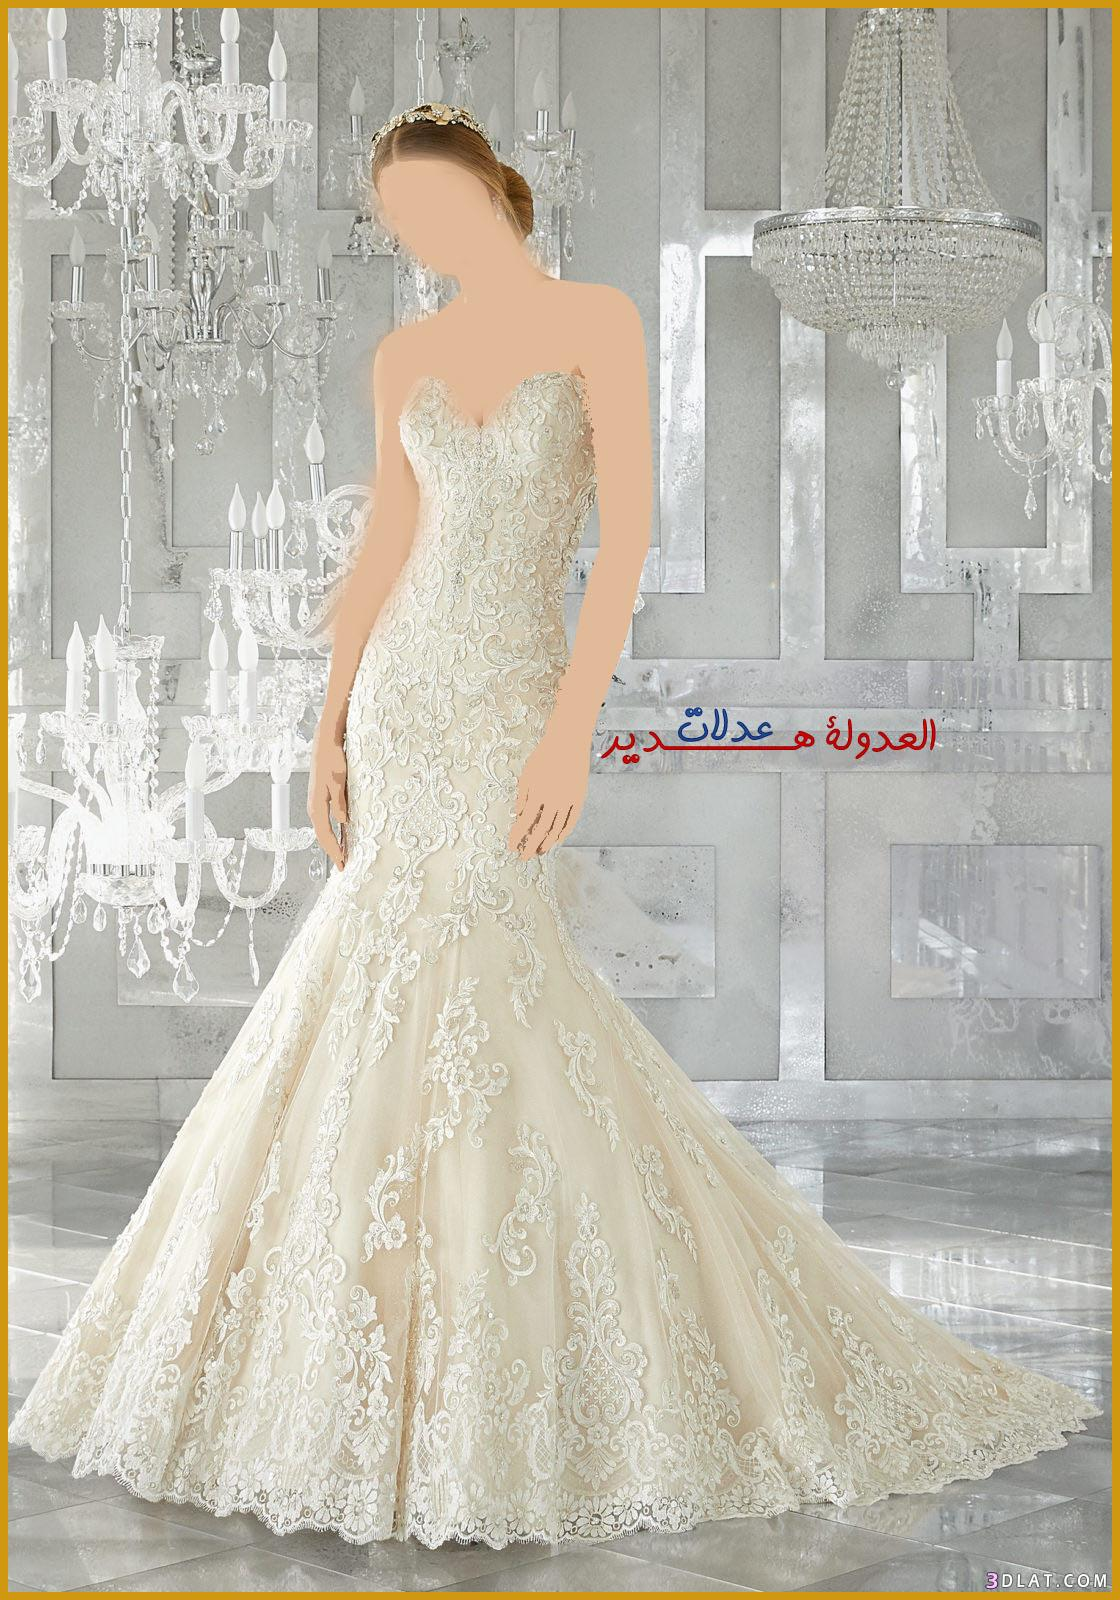 فساتين زفاف فخمة 2018,فساتين اعراس ناعمة,فساتين 3dlat.com_27_18_30f4